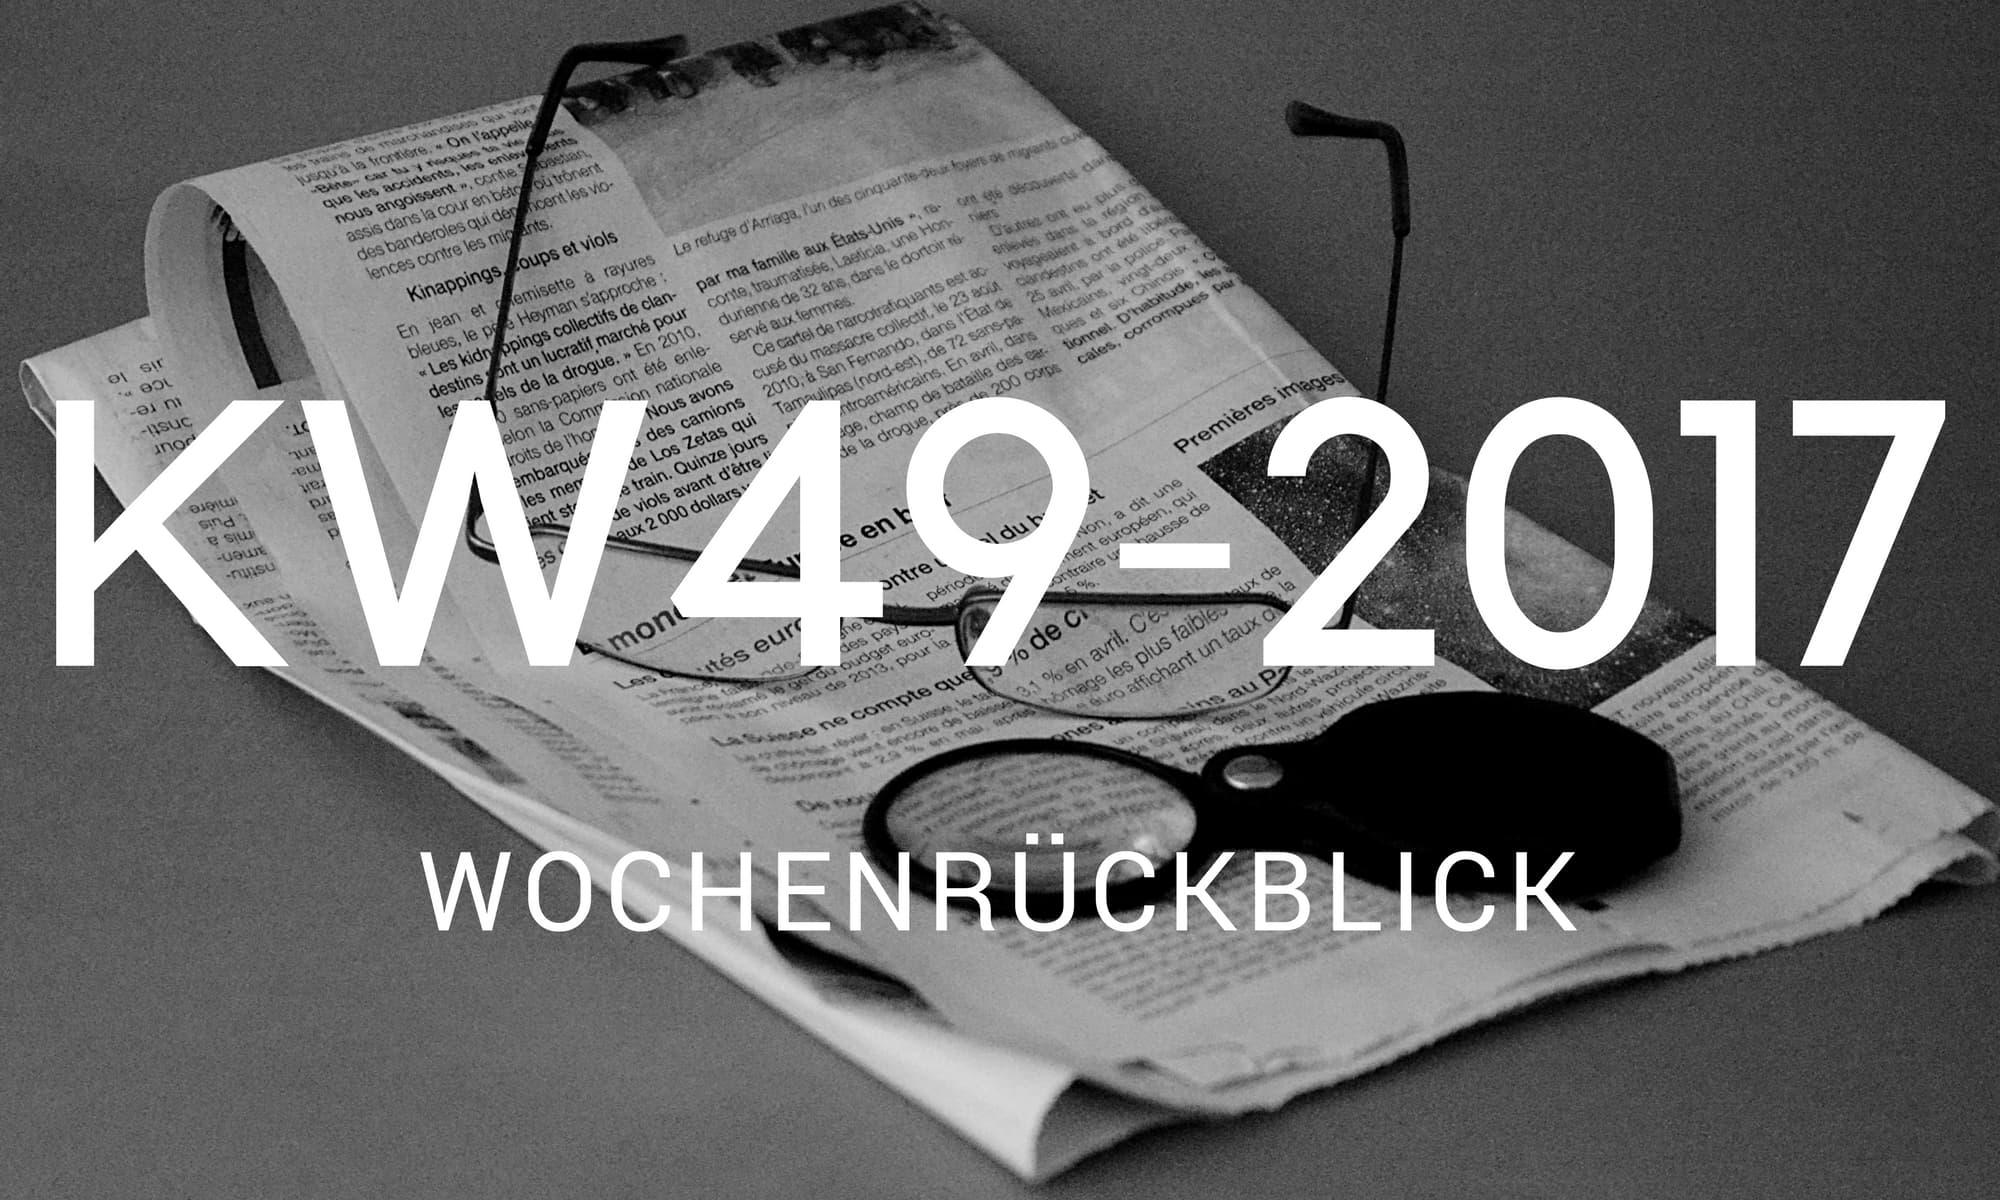 wochenrueckblick camping news KW49 2017